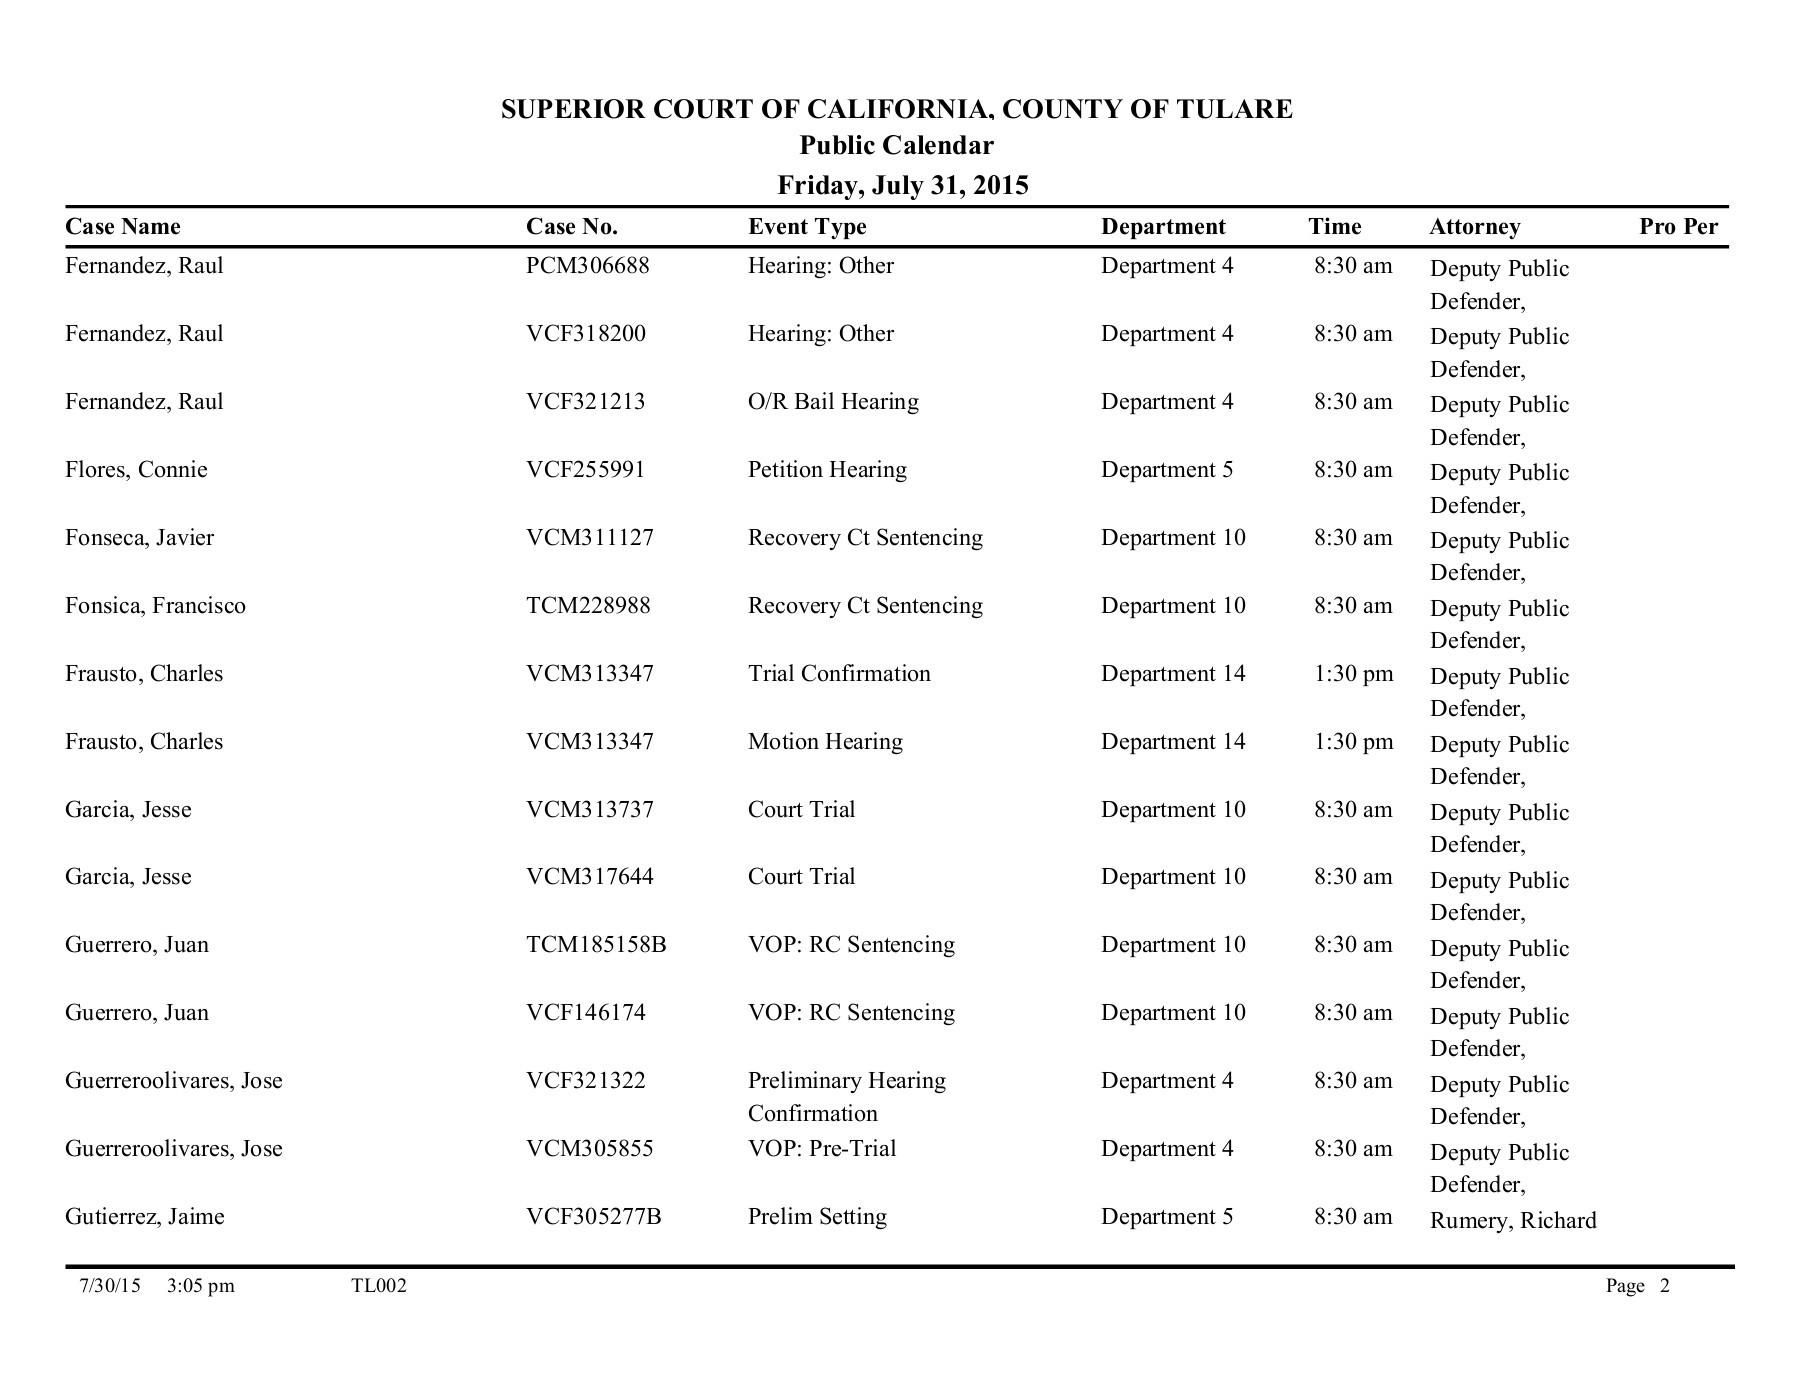 Superior Court Calendar - Visalia Regarding Monterey County Court Calendar